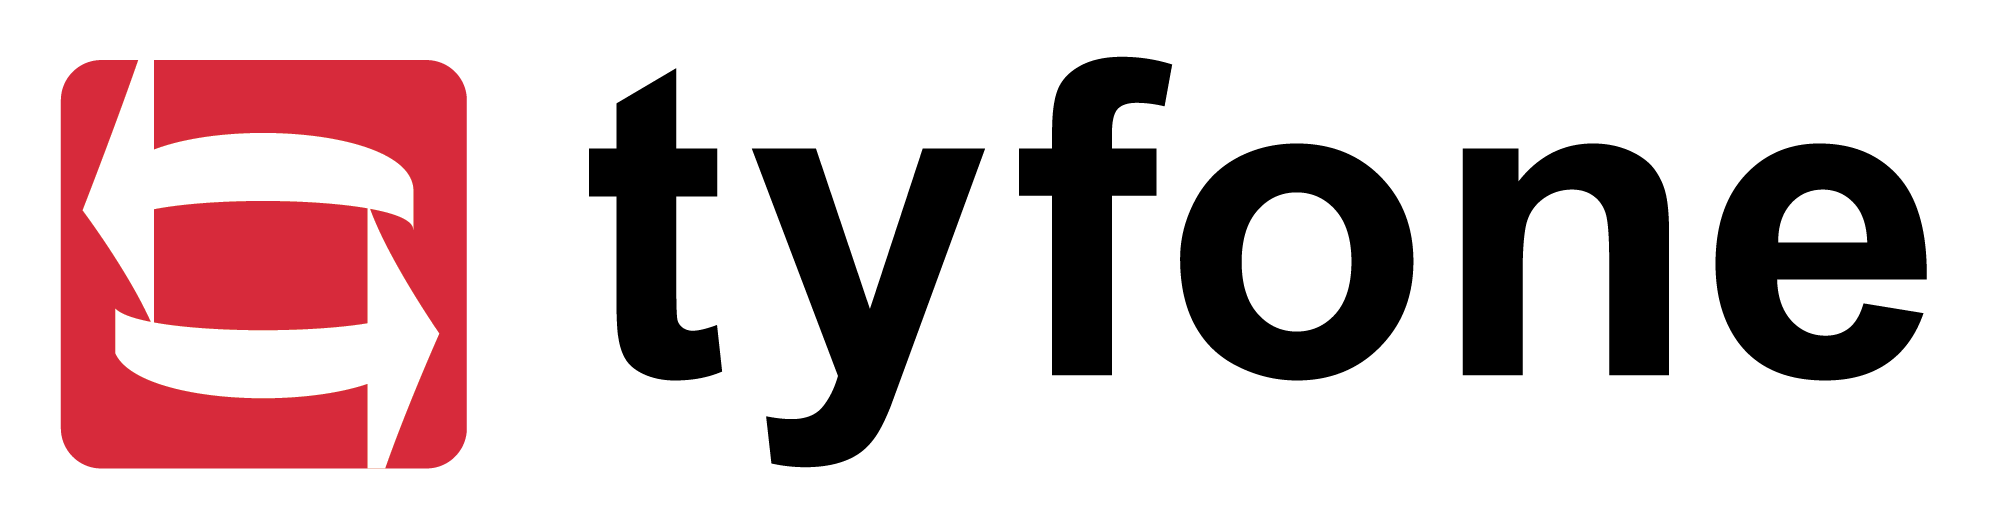 Tyfone logo blk txt trans bg